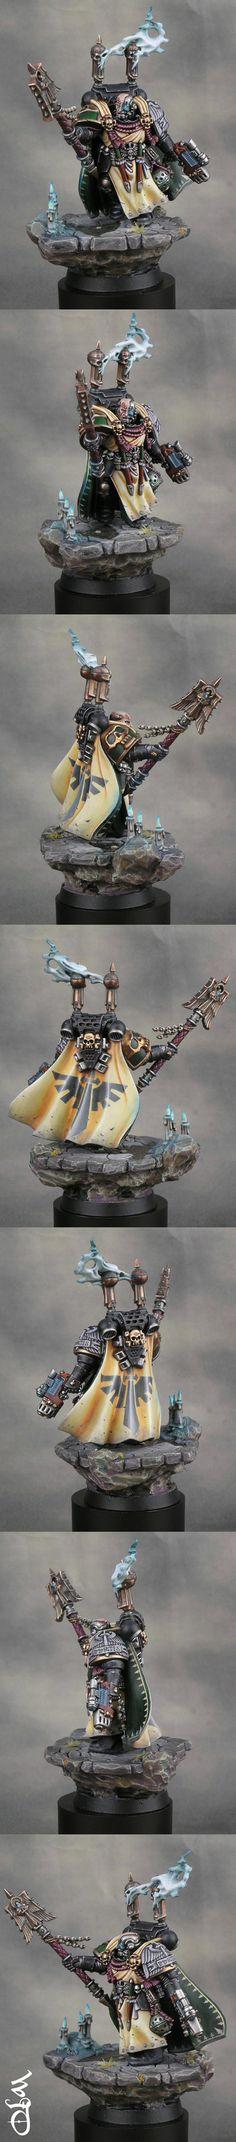 Dark Vengeance Limited Edition Interrogator Chaplain Seraphicus - Bronze 40K Single Category GDUK'12